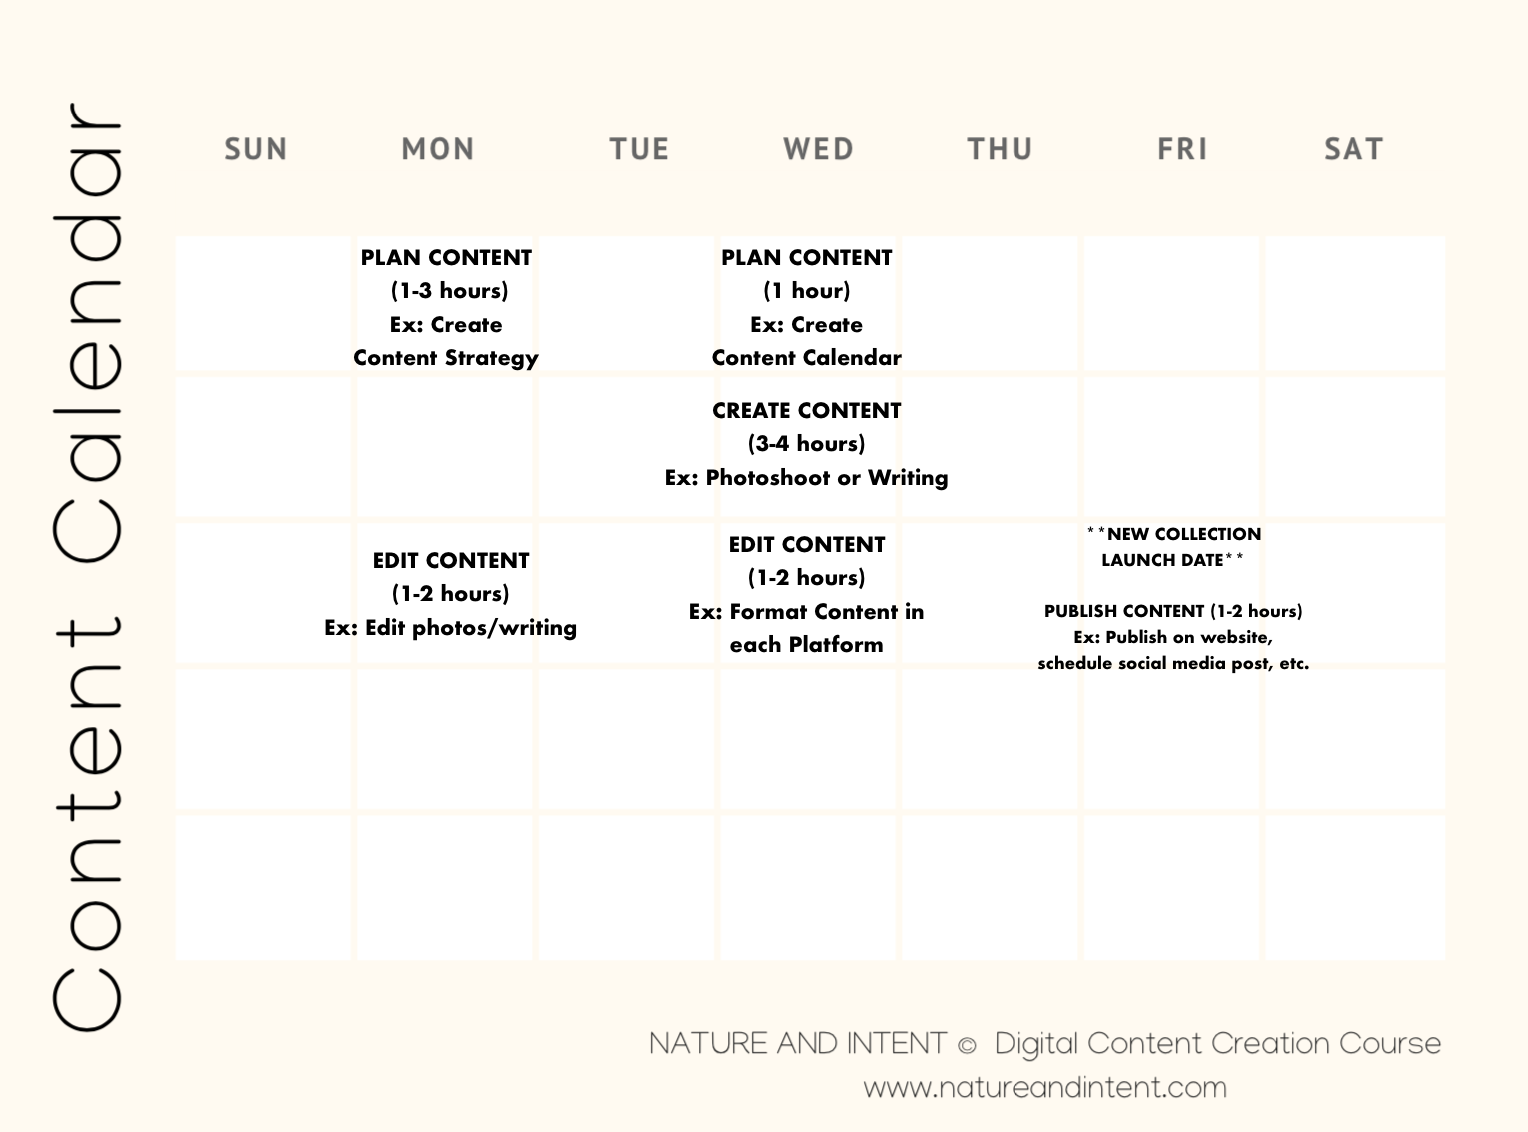 NatureandIntent_ContentCalendar_Example.png